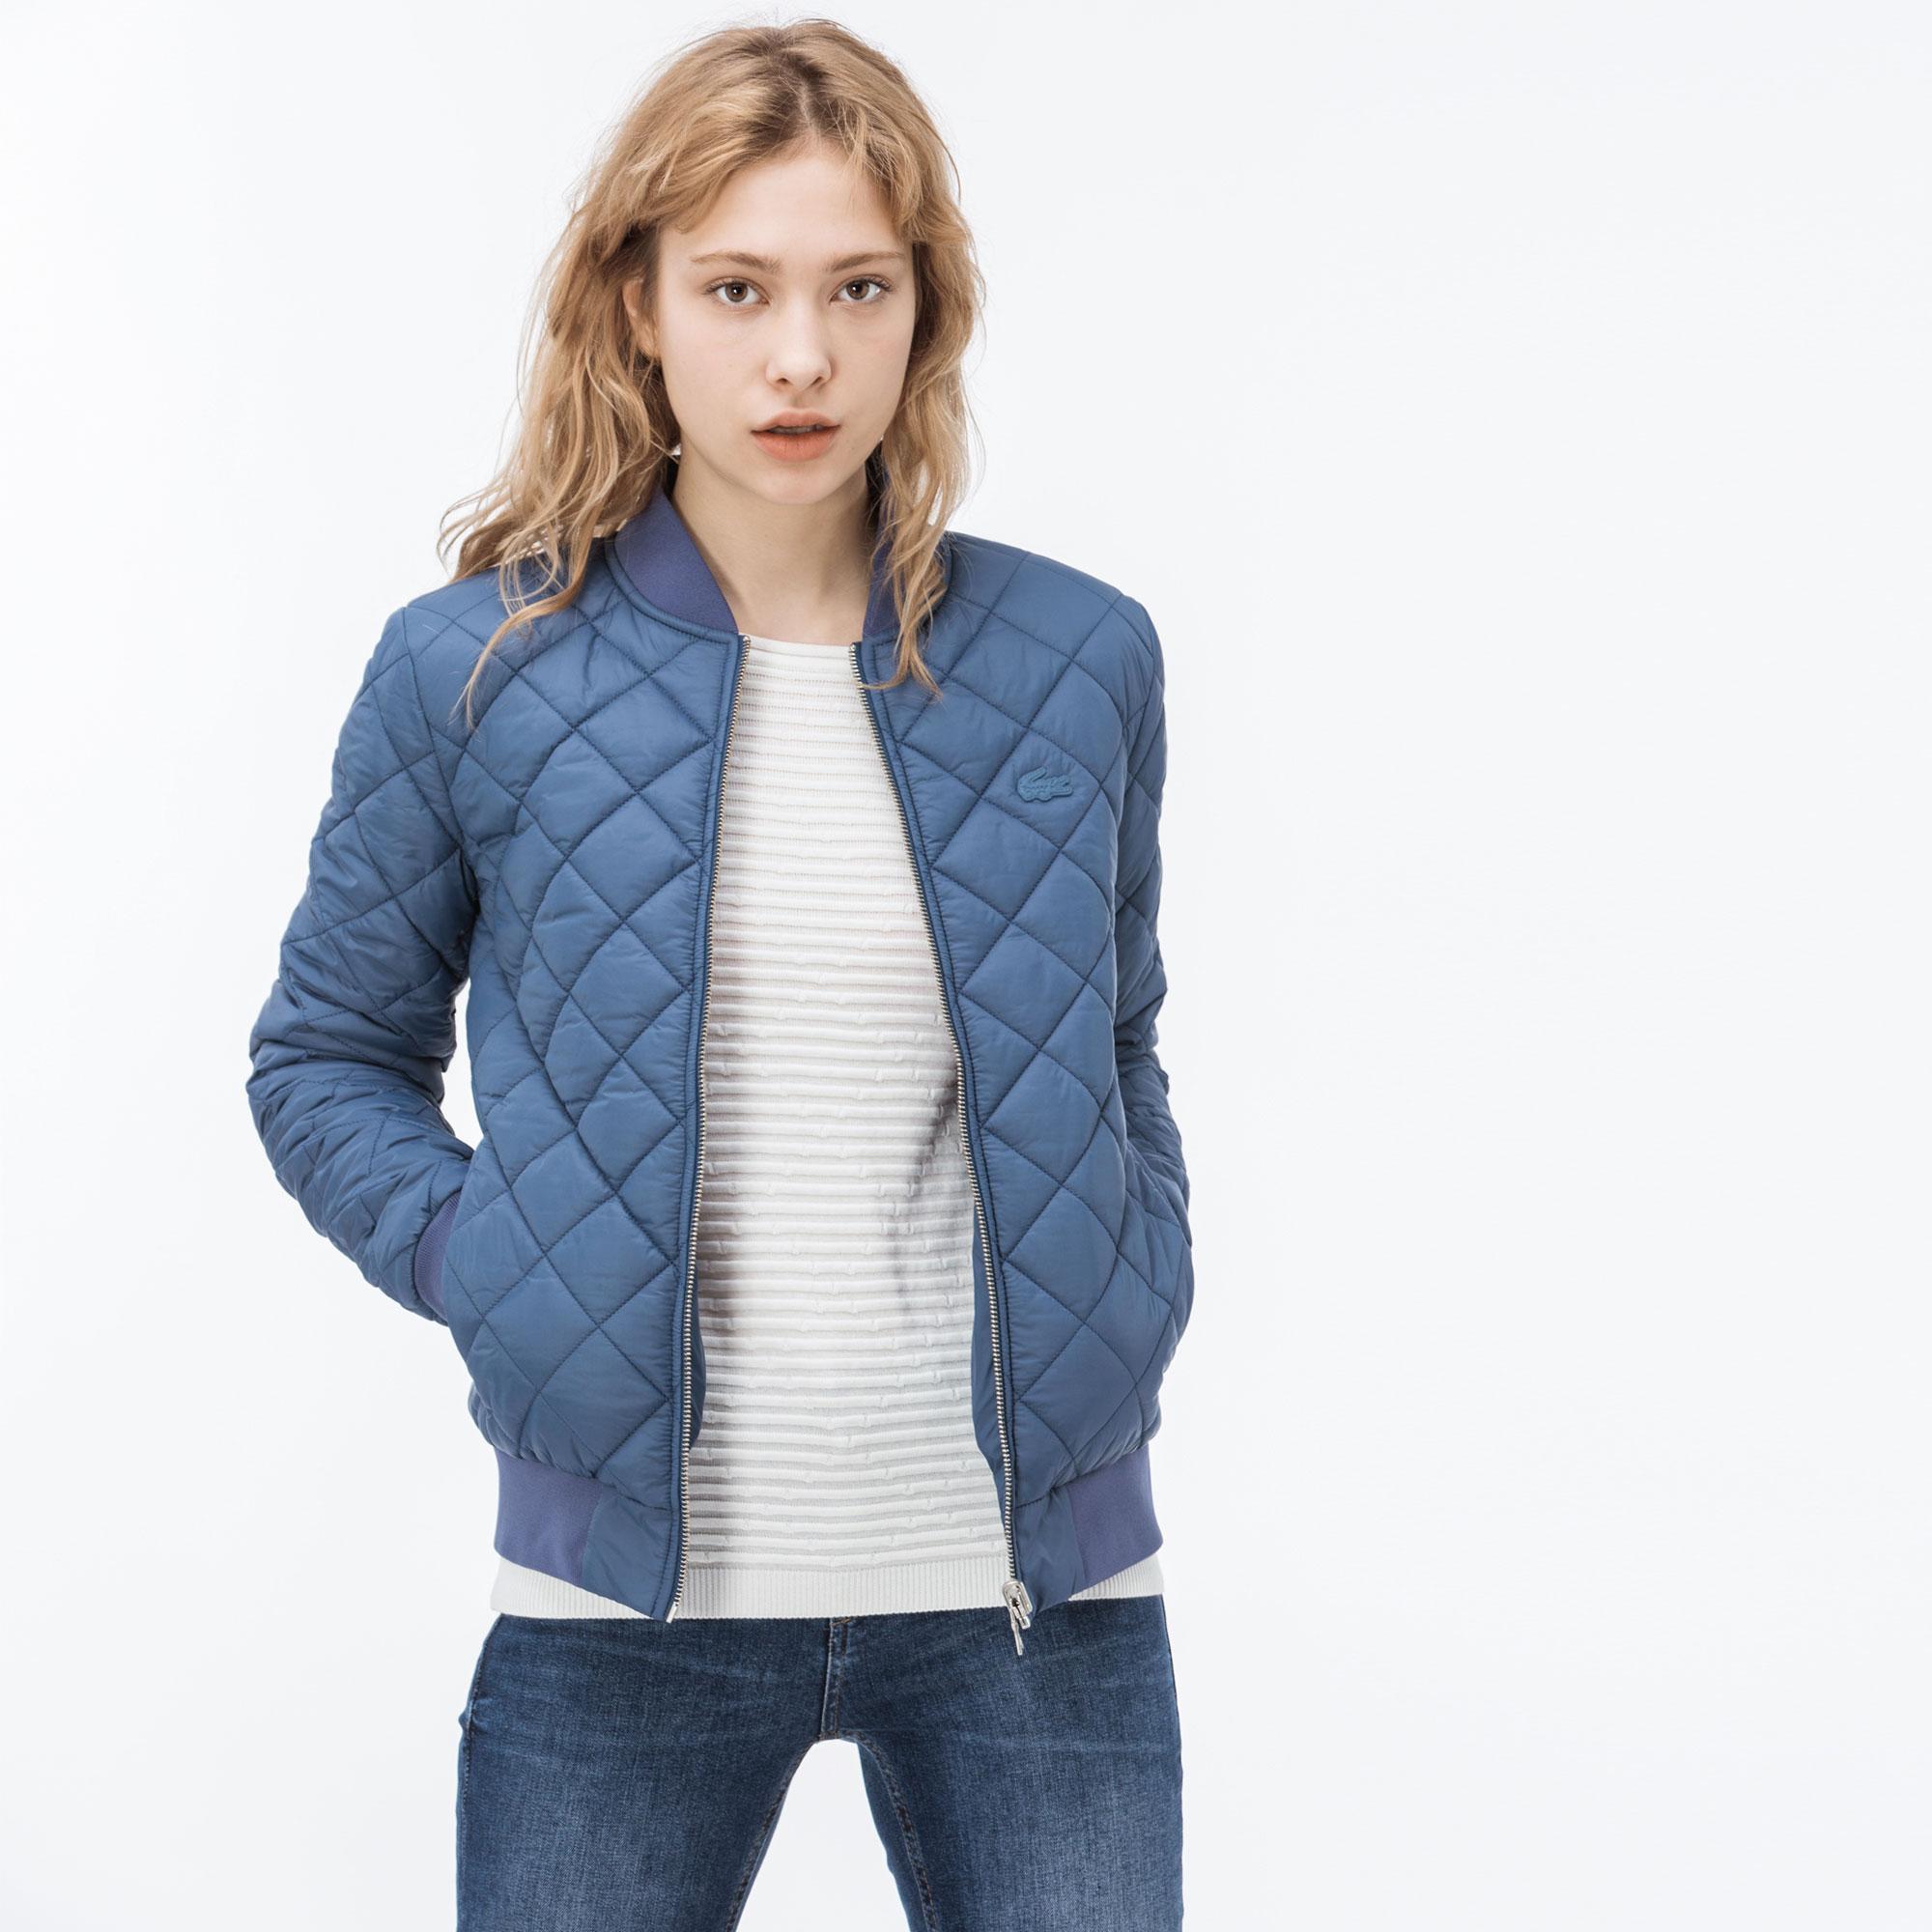 Купить Куртка Lacoste, голубой, BF0905